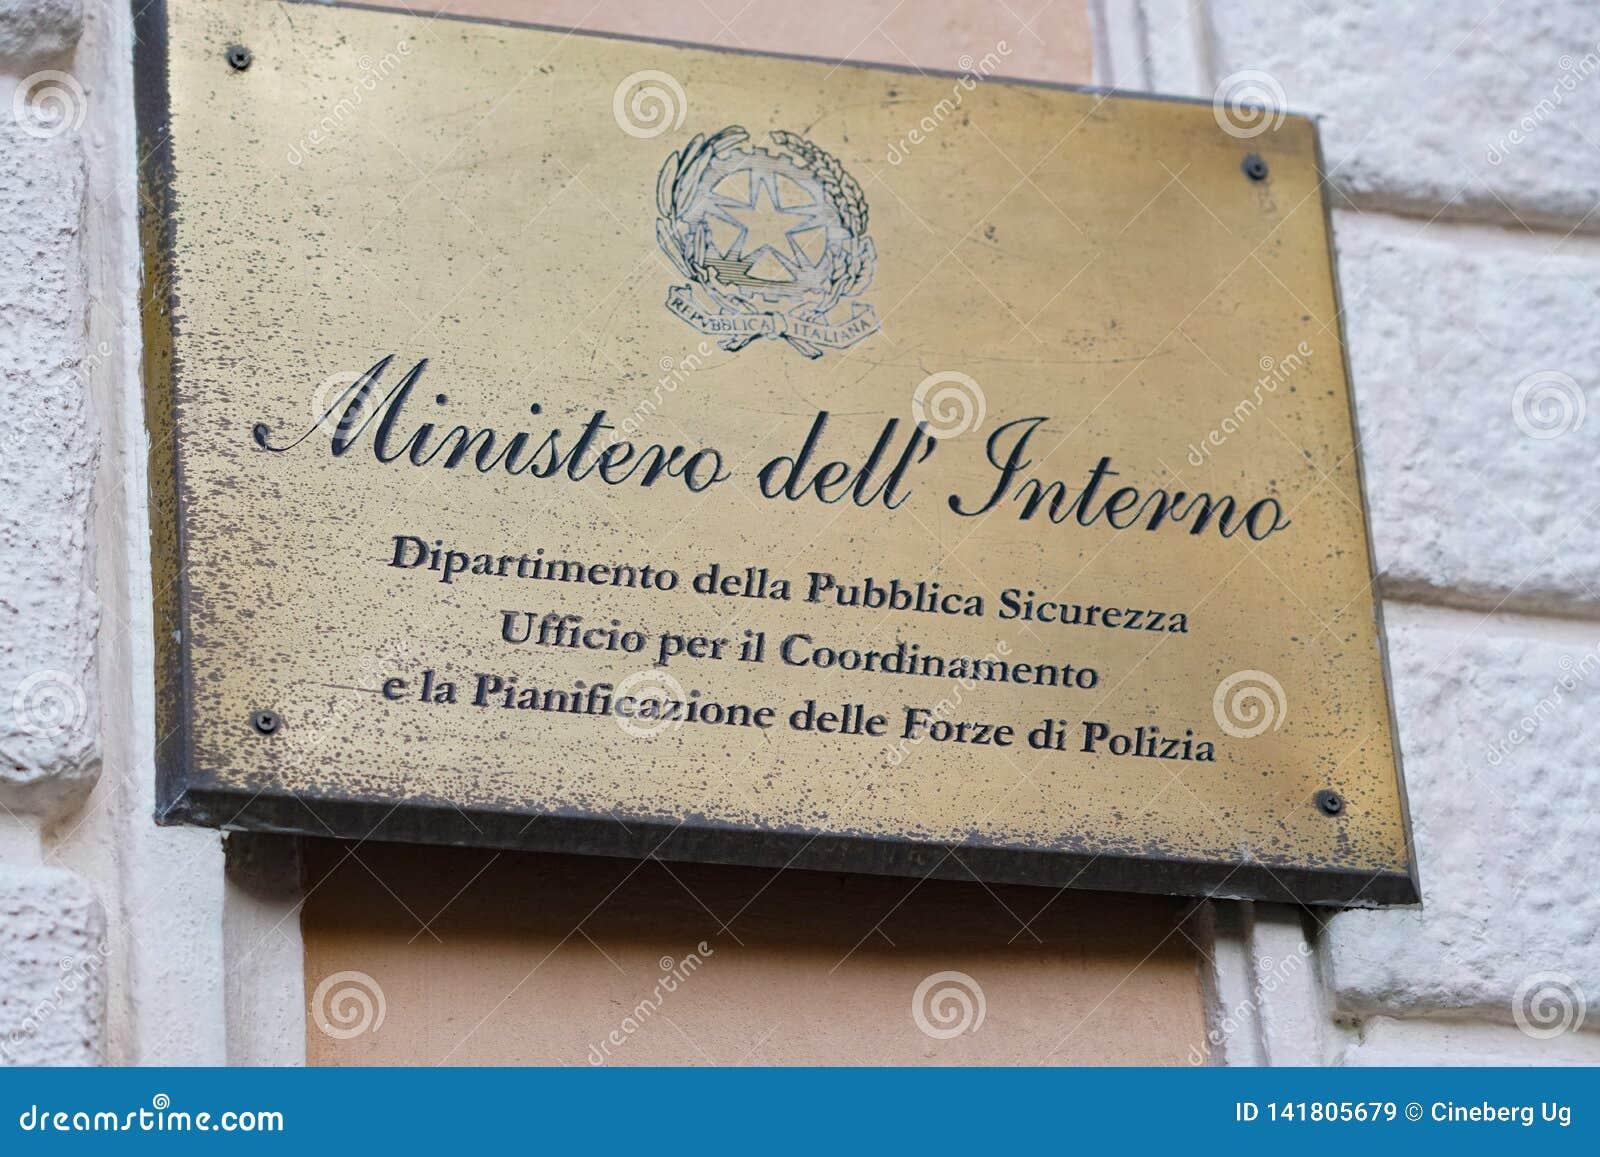 Italian Ministry of Interior Department